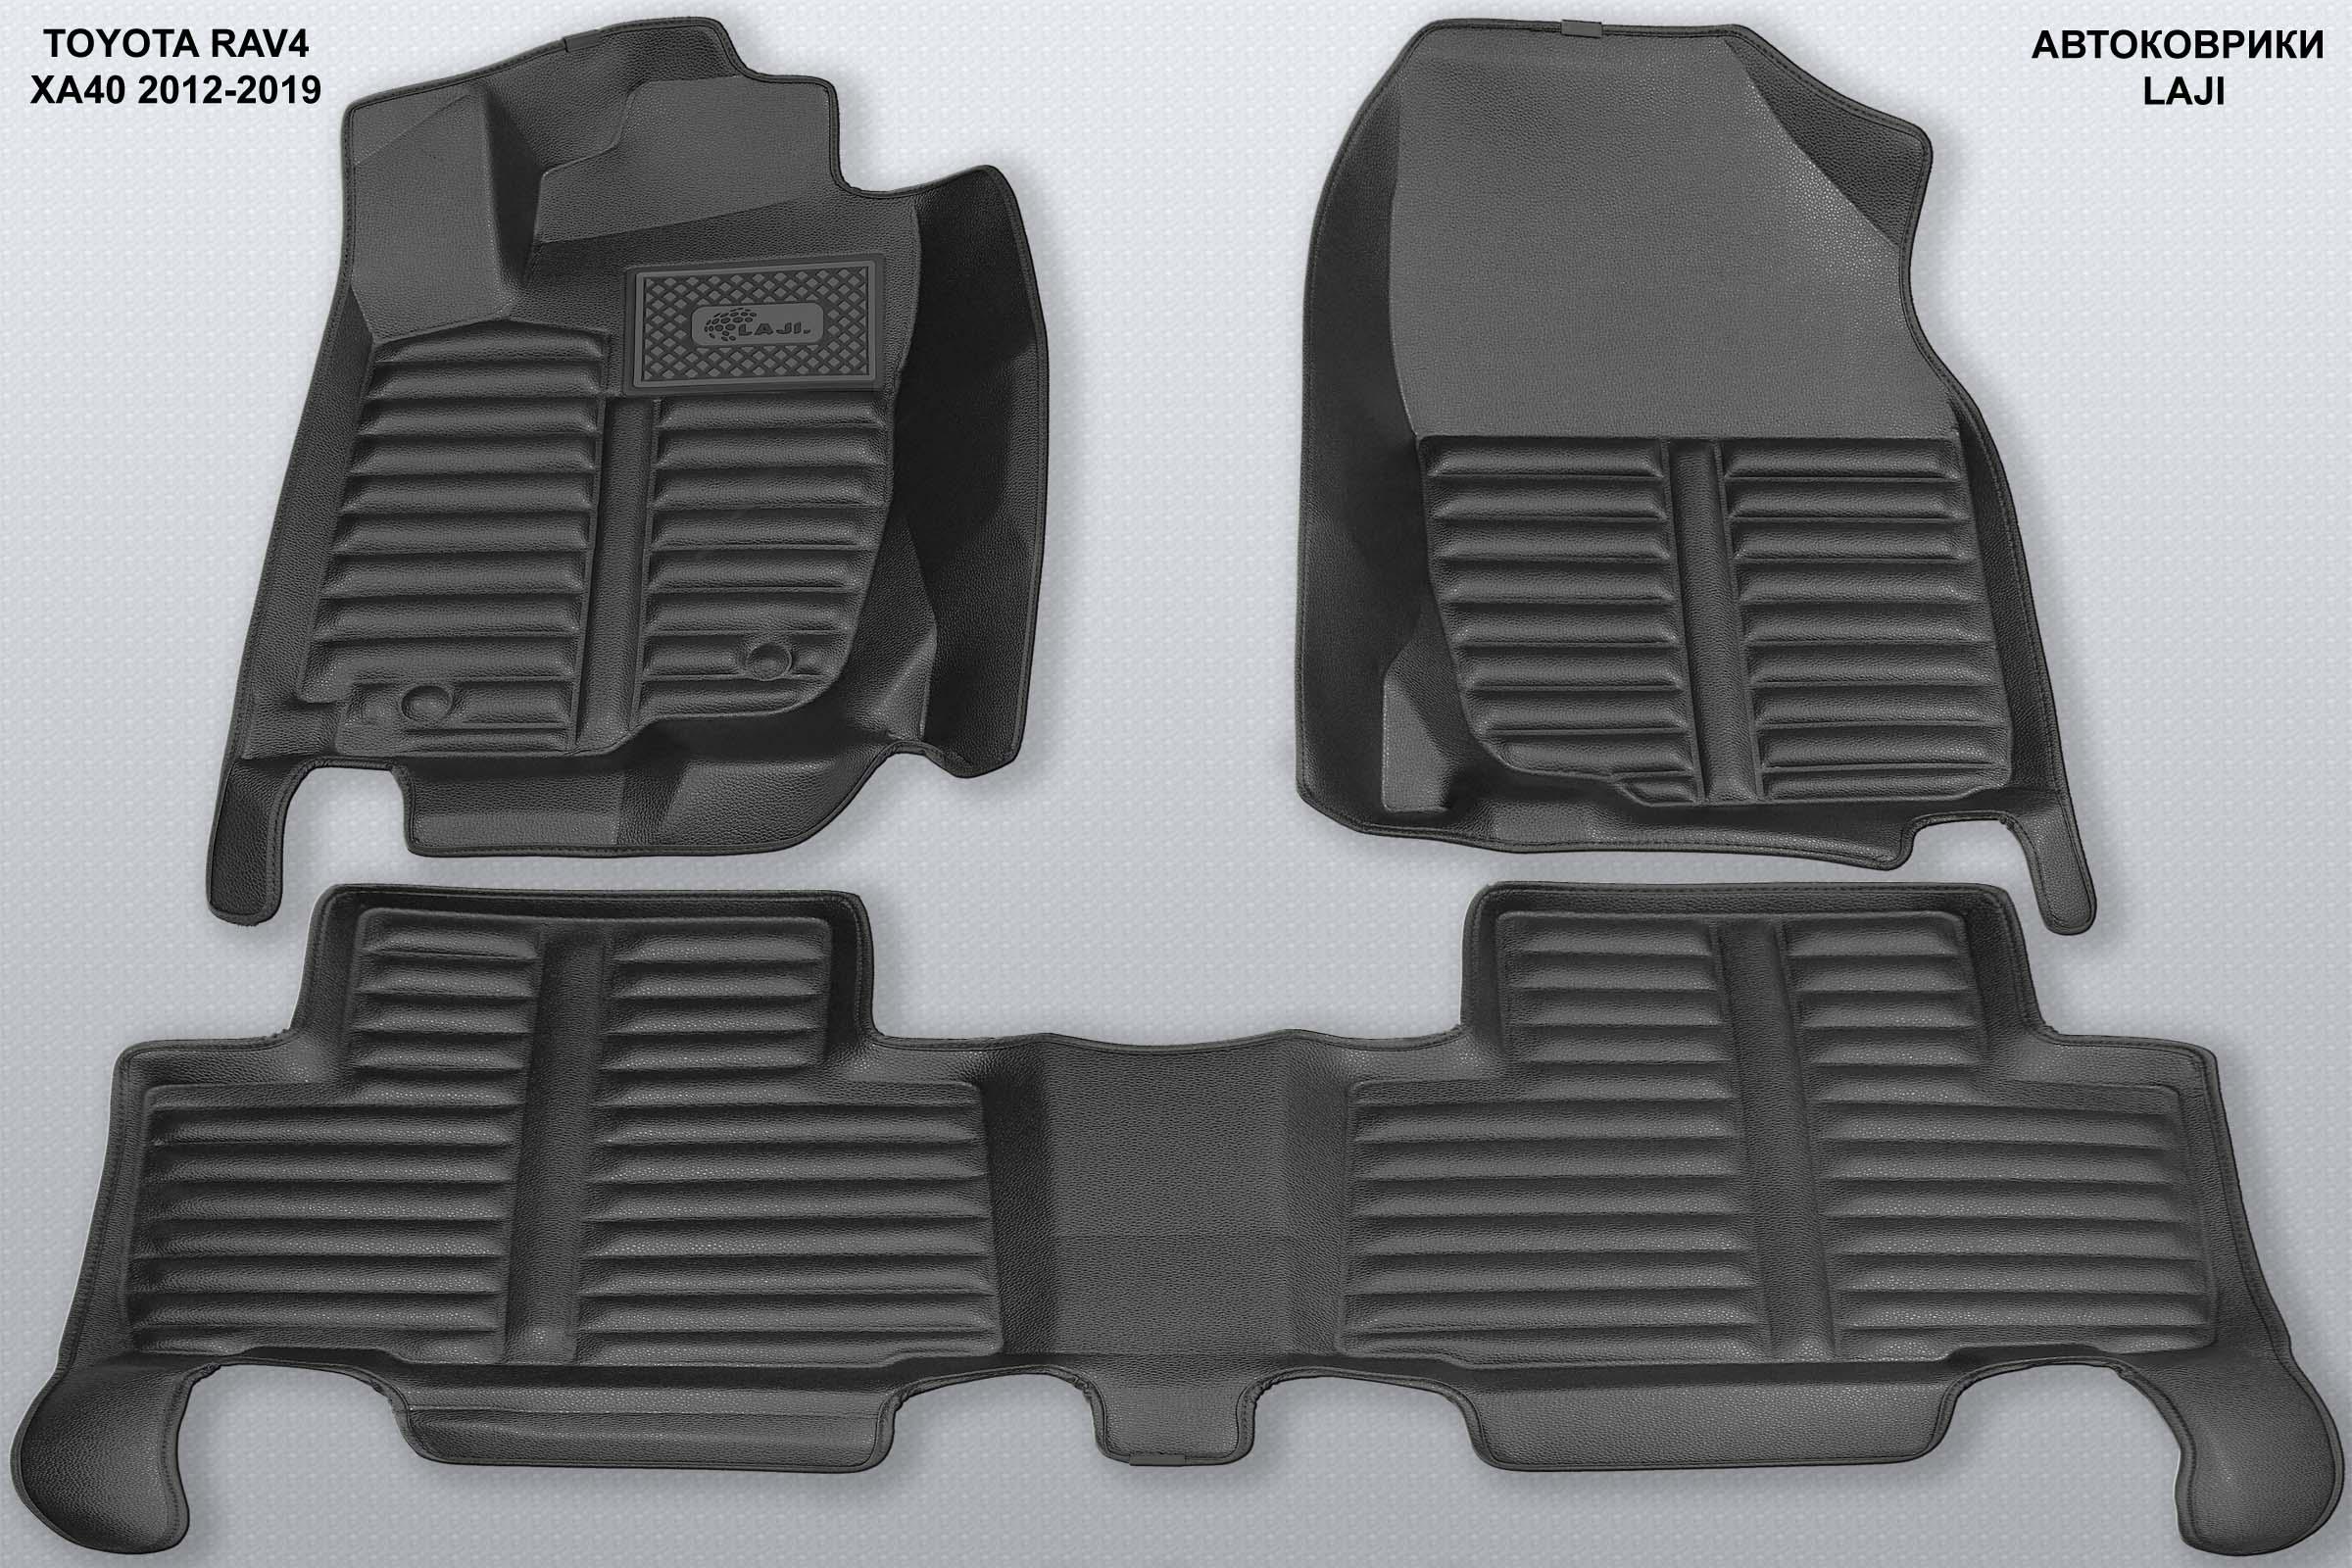 5D коврики в салон Toyota RAV4 CA40 2012-2019 1